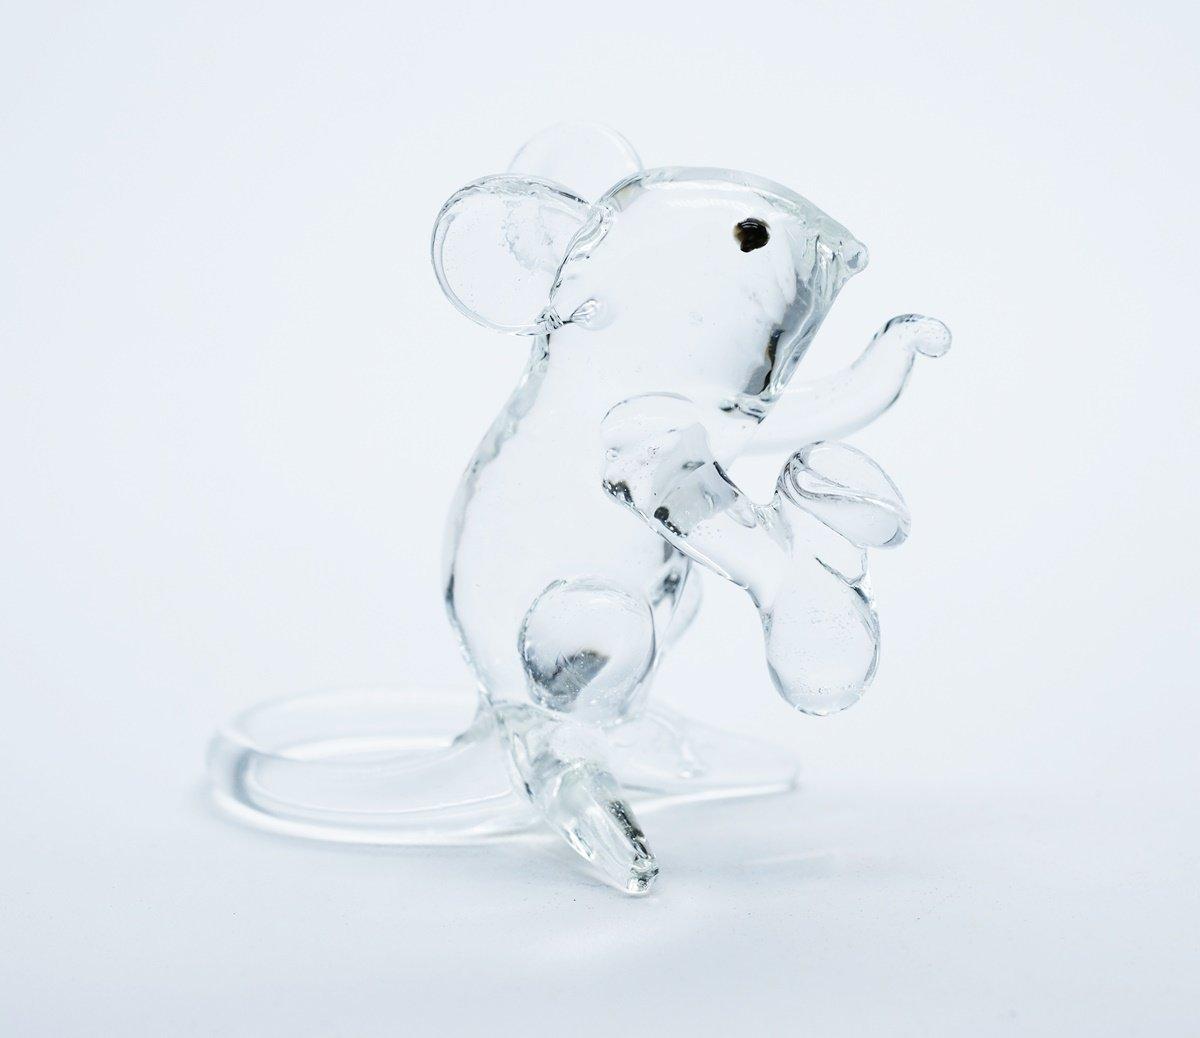 3 D Crystal Toy LuckyRat Hand Bowl Glass Dollhouse Miniatures Decoration CoolPrice Glass